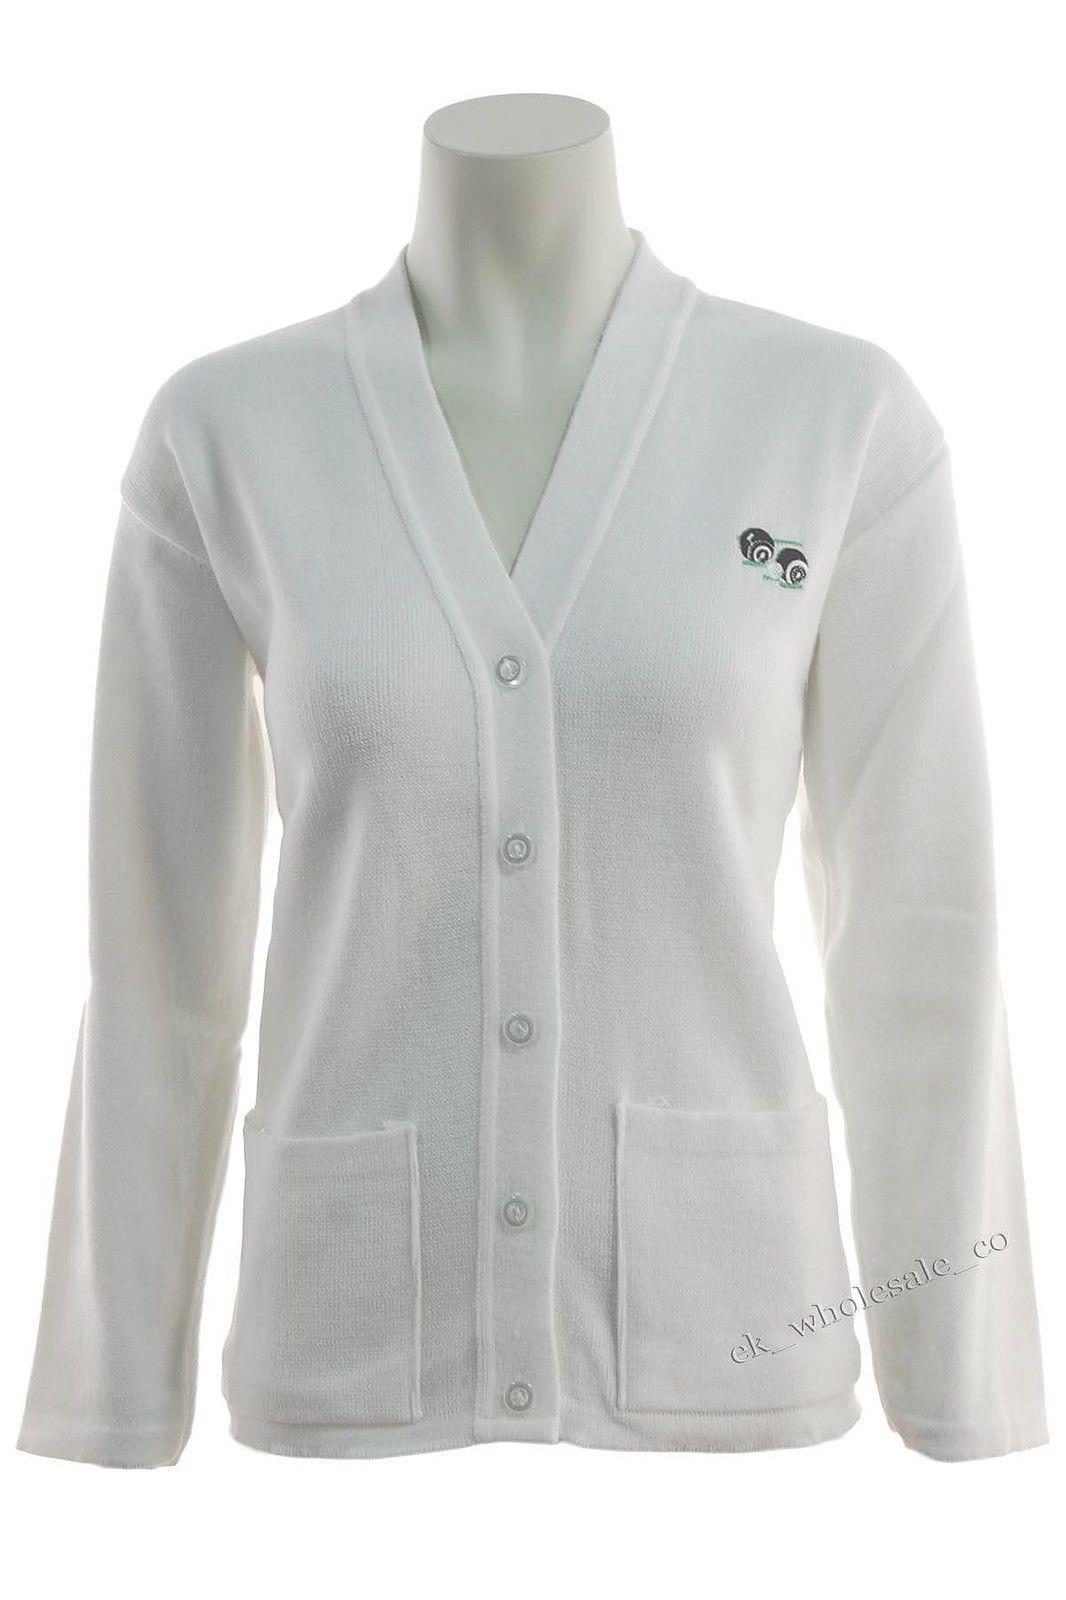 5XL Ladies Bowls Logo Cardigan White Sizes S Womans Bowlswear UK Bowls Jumper